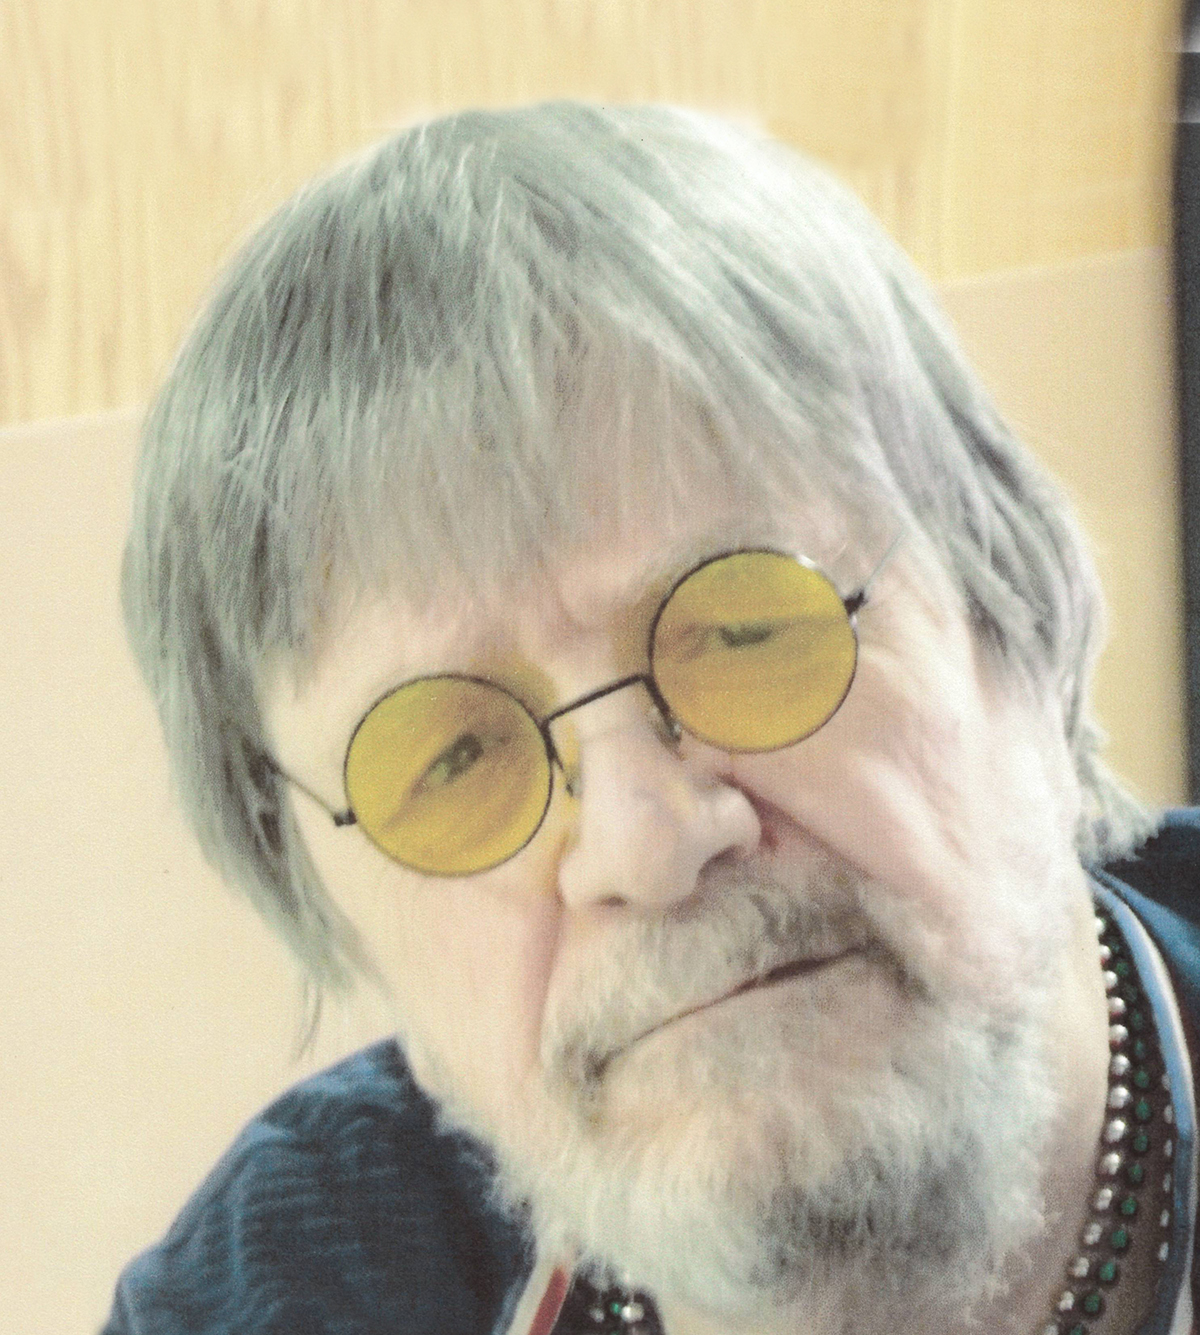 Robert E. Kimberly, 78 years of age, of Hebron, Nebraska (formerly of Holdrege and Oxford, Nebraska)